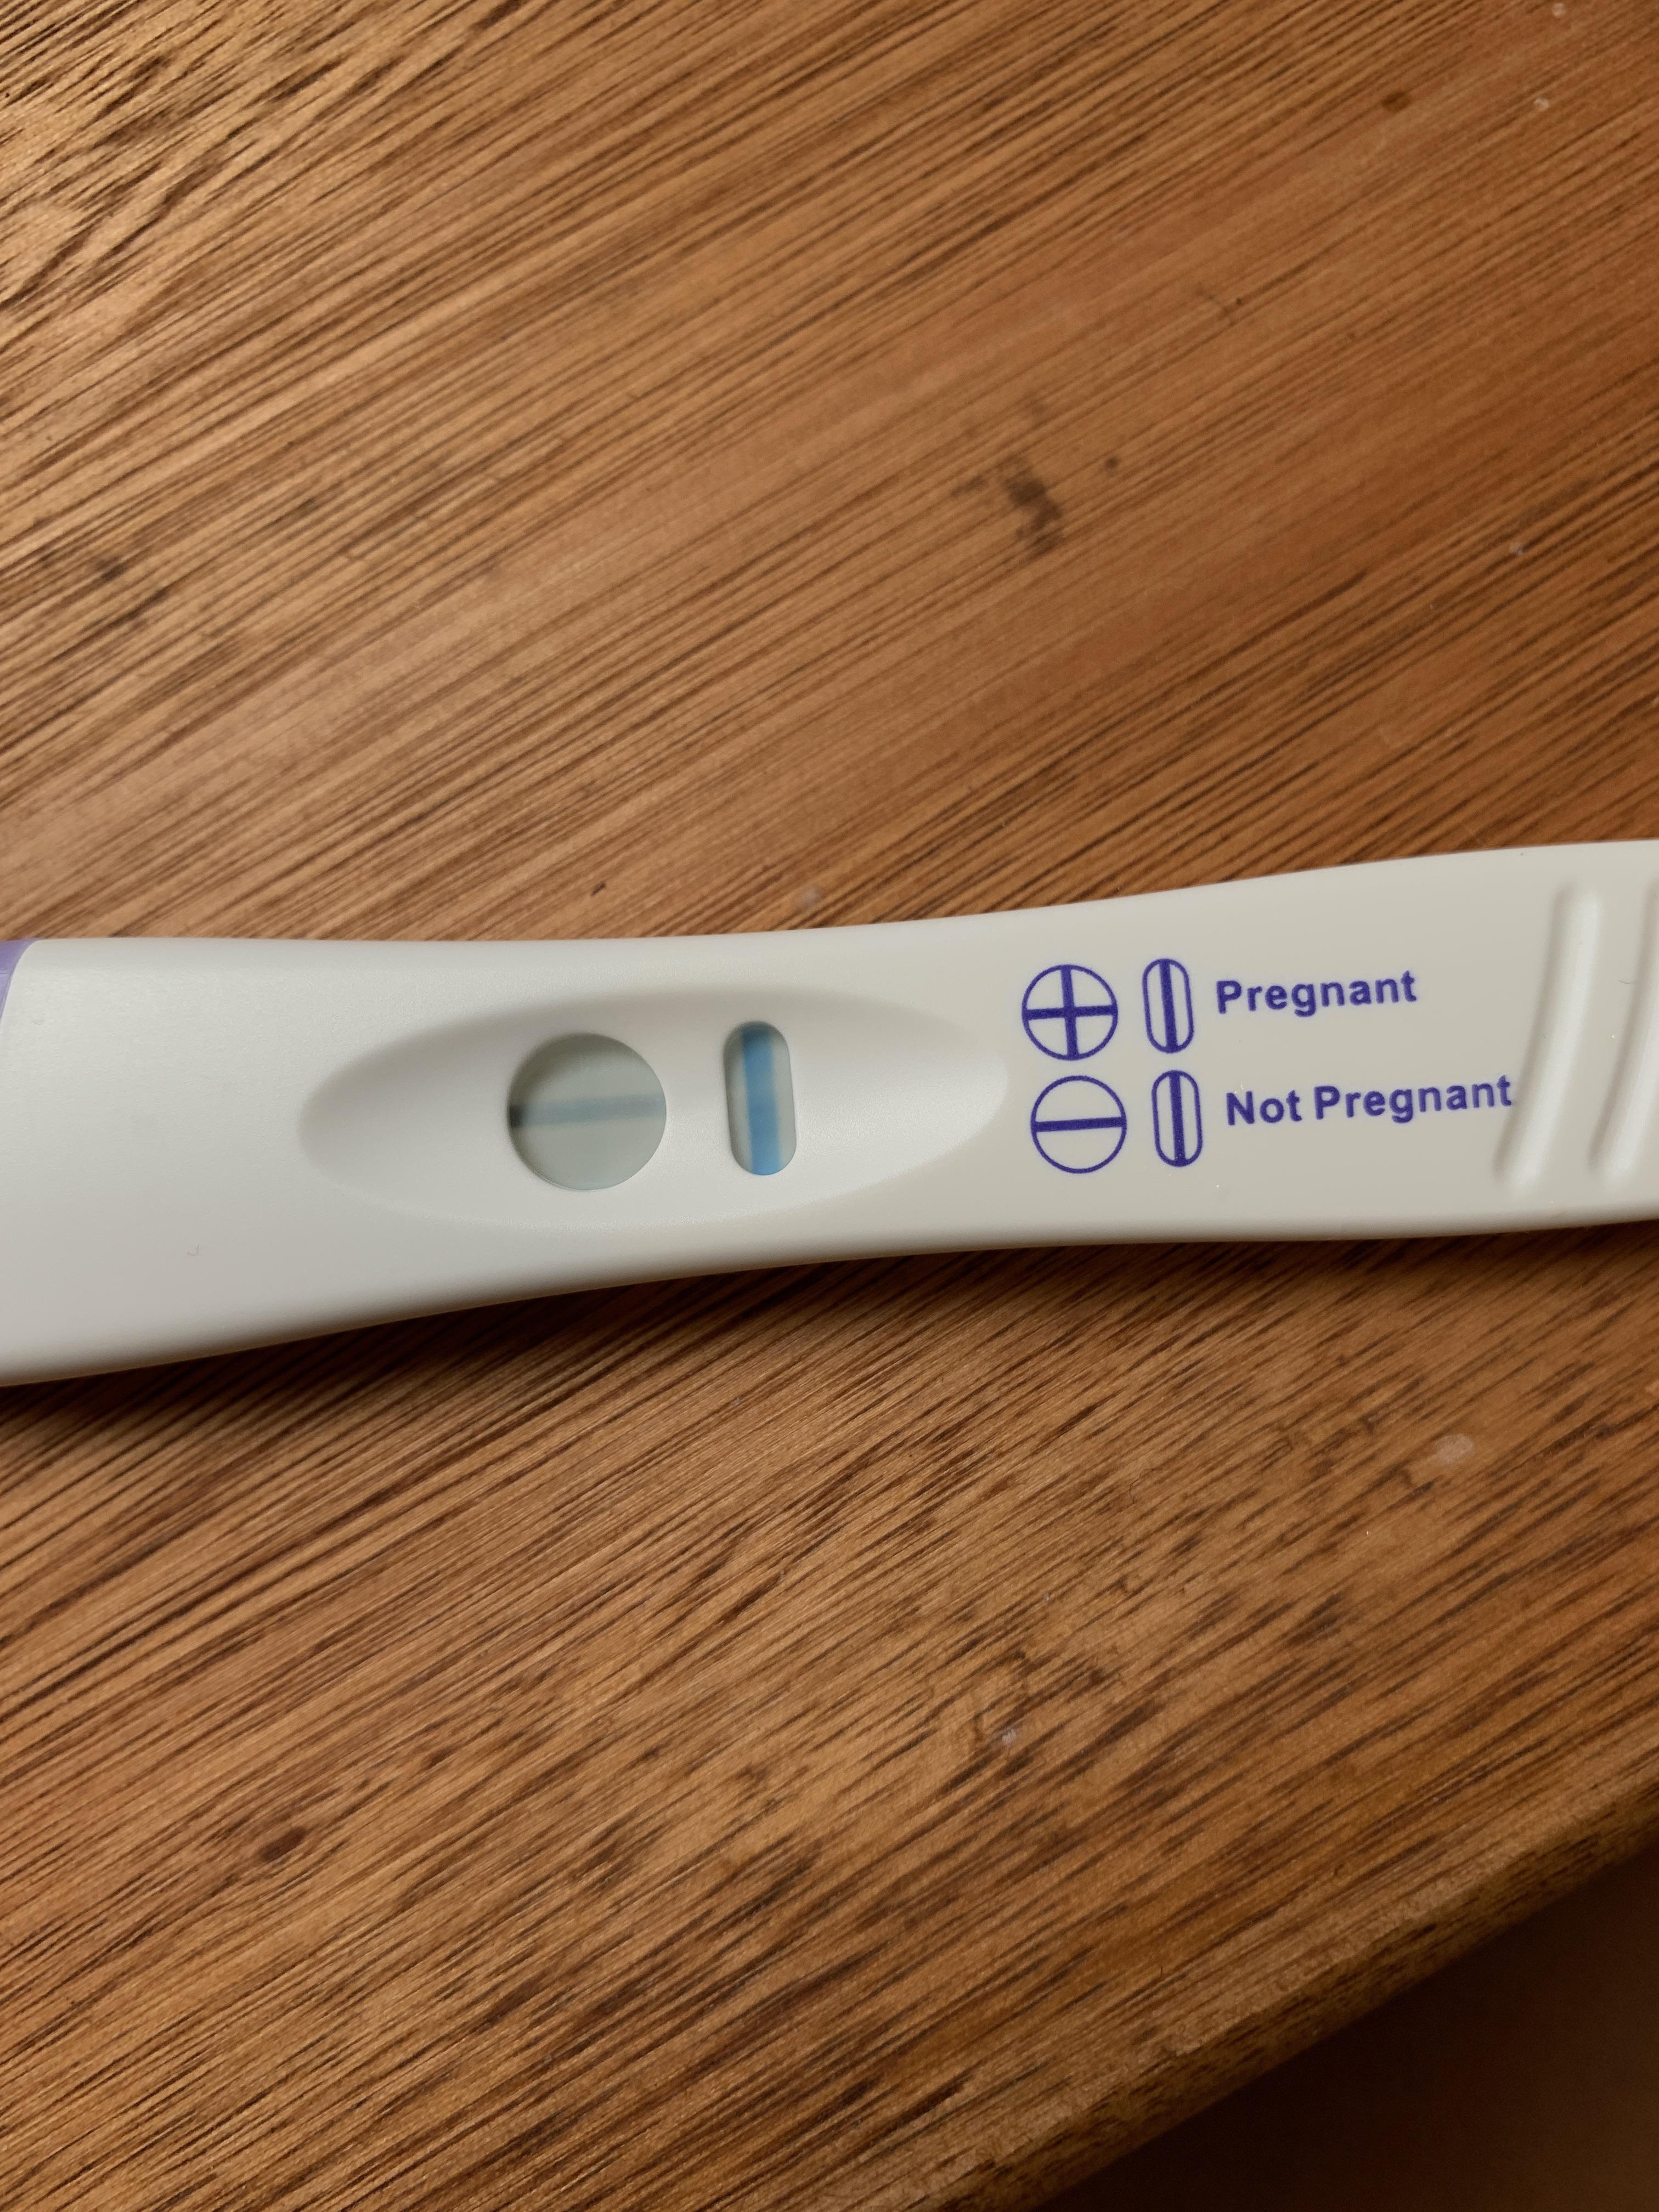 Cvs Pregnancy Test Faint Line : pregnancy, faint, Early, Response., Faint, Line??, TFABLinePorn